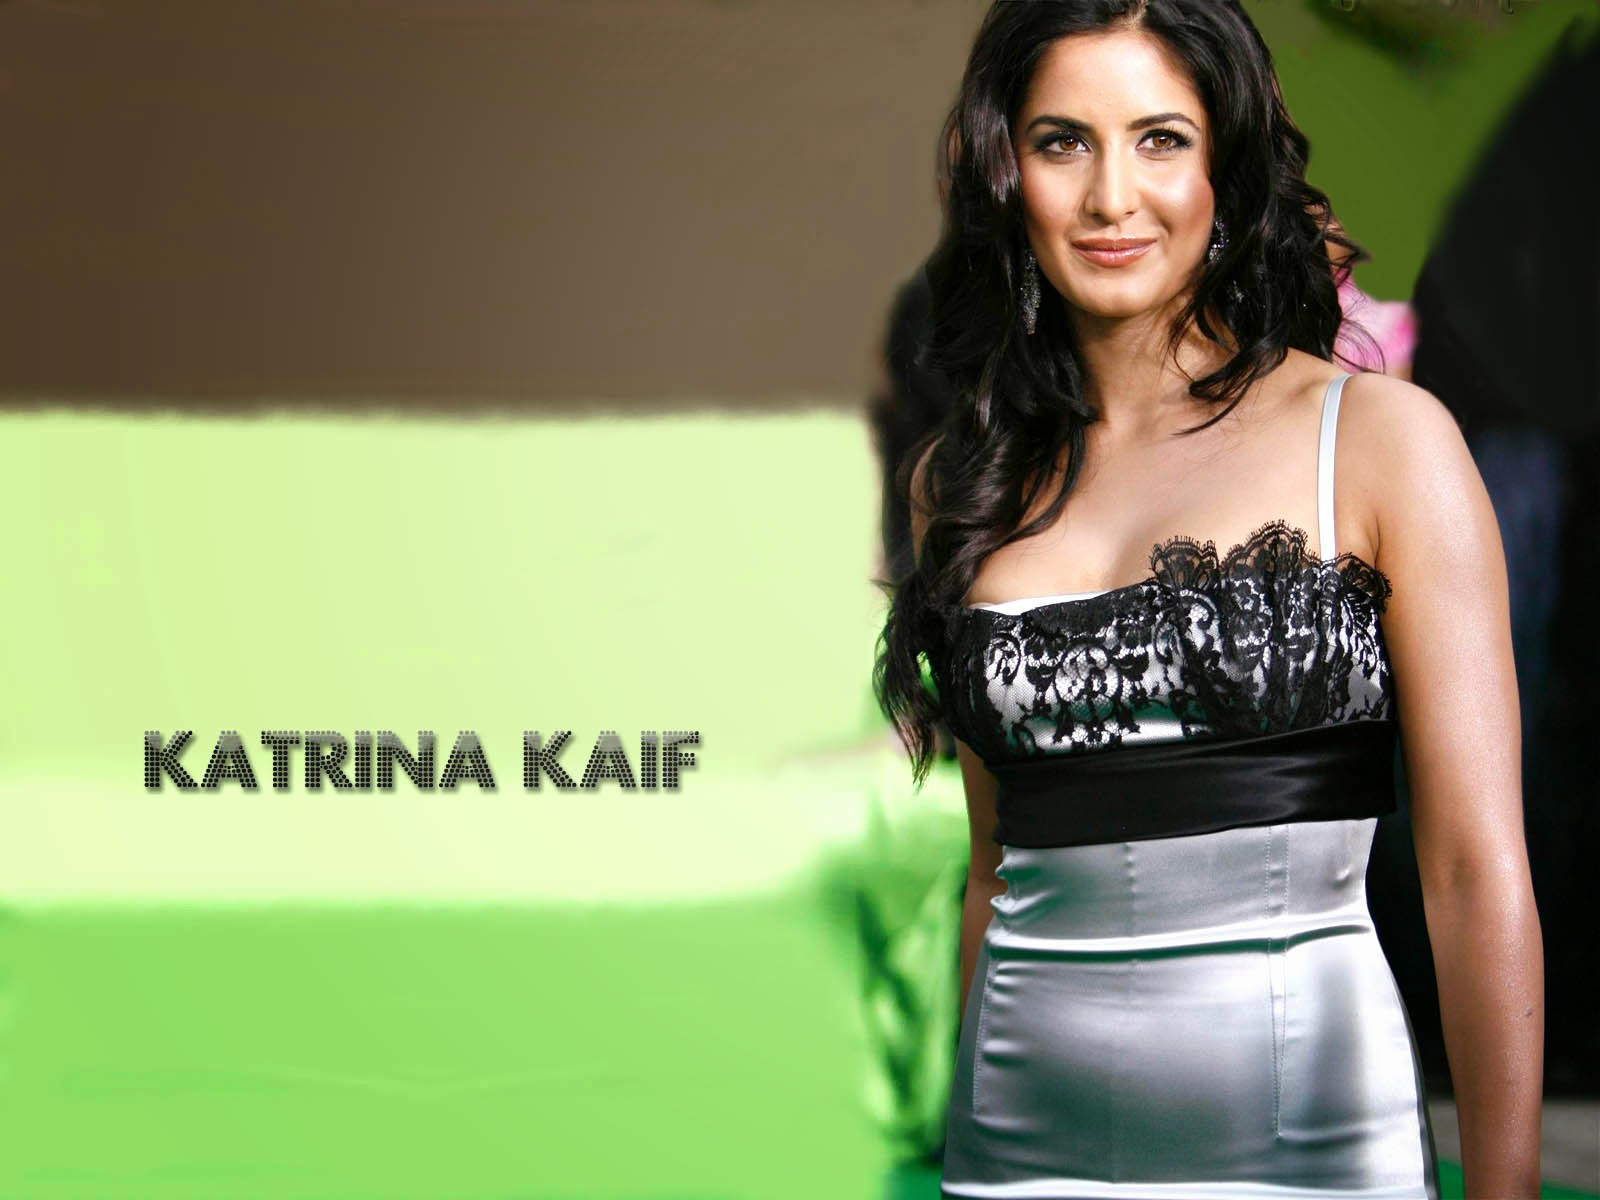 Katrina Kaif Xxx Large Size Hd Wallpapers - 8 Pics